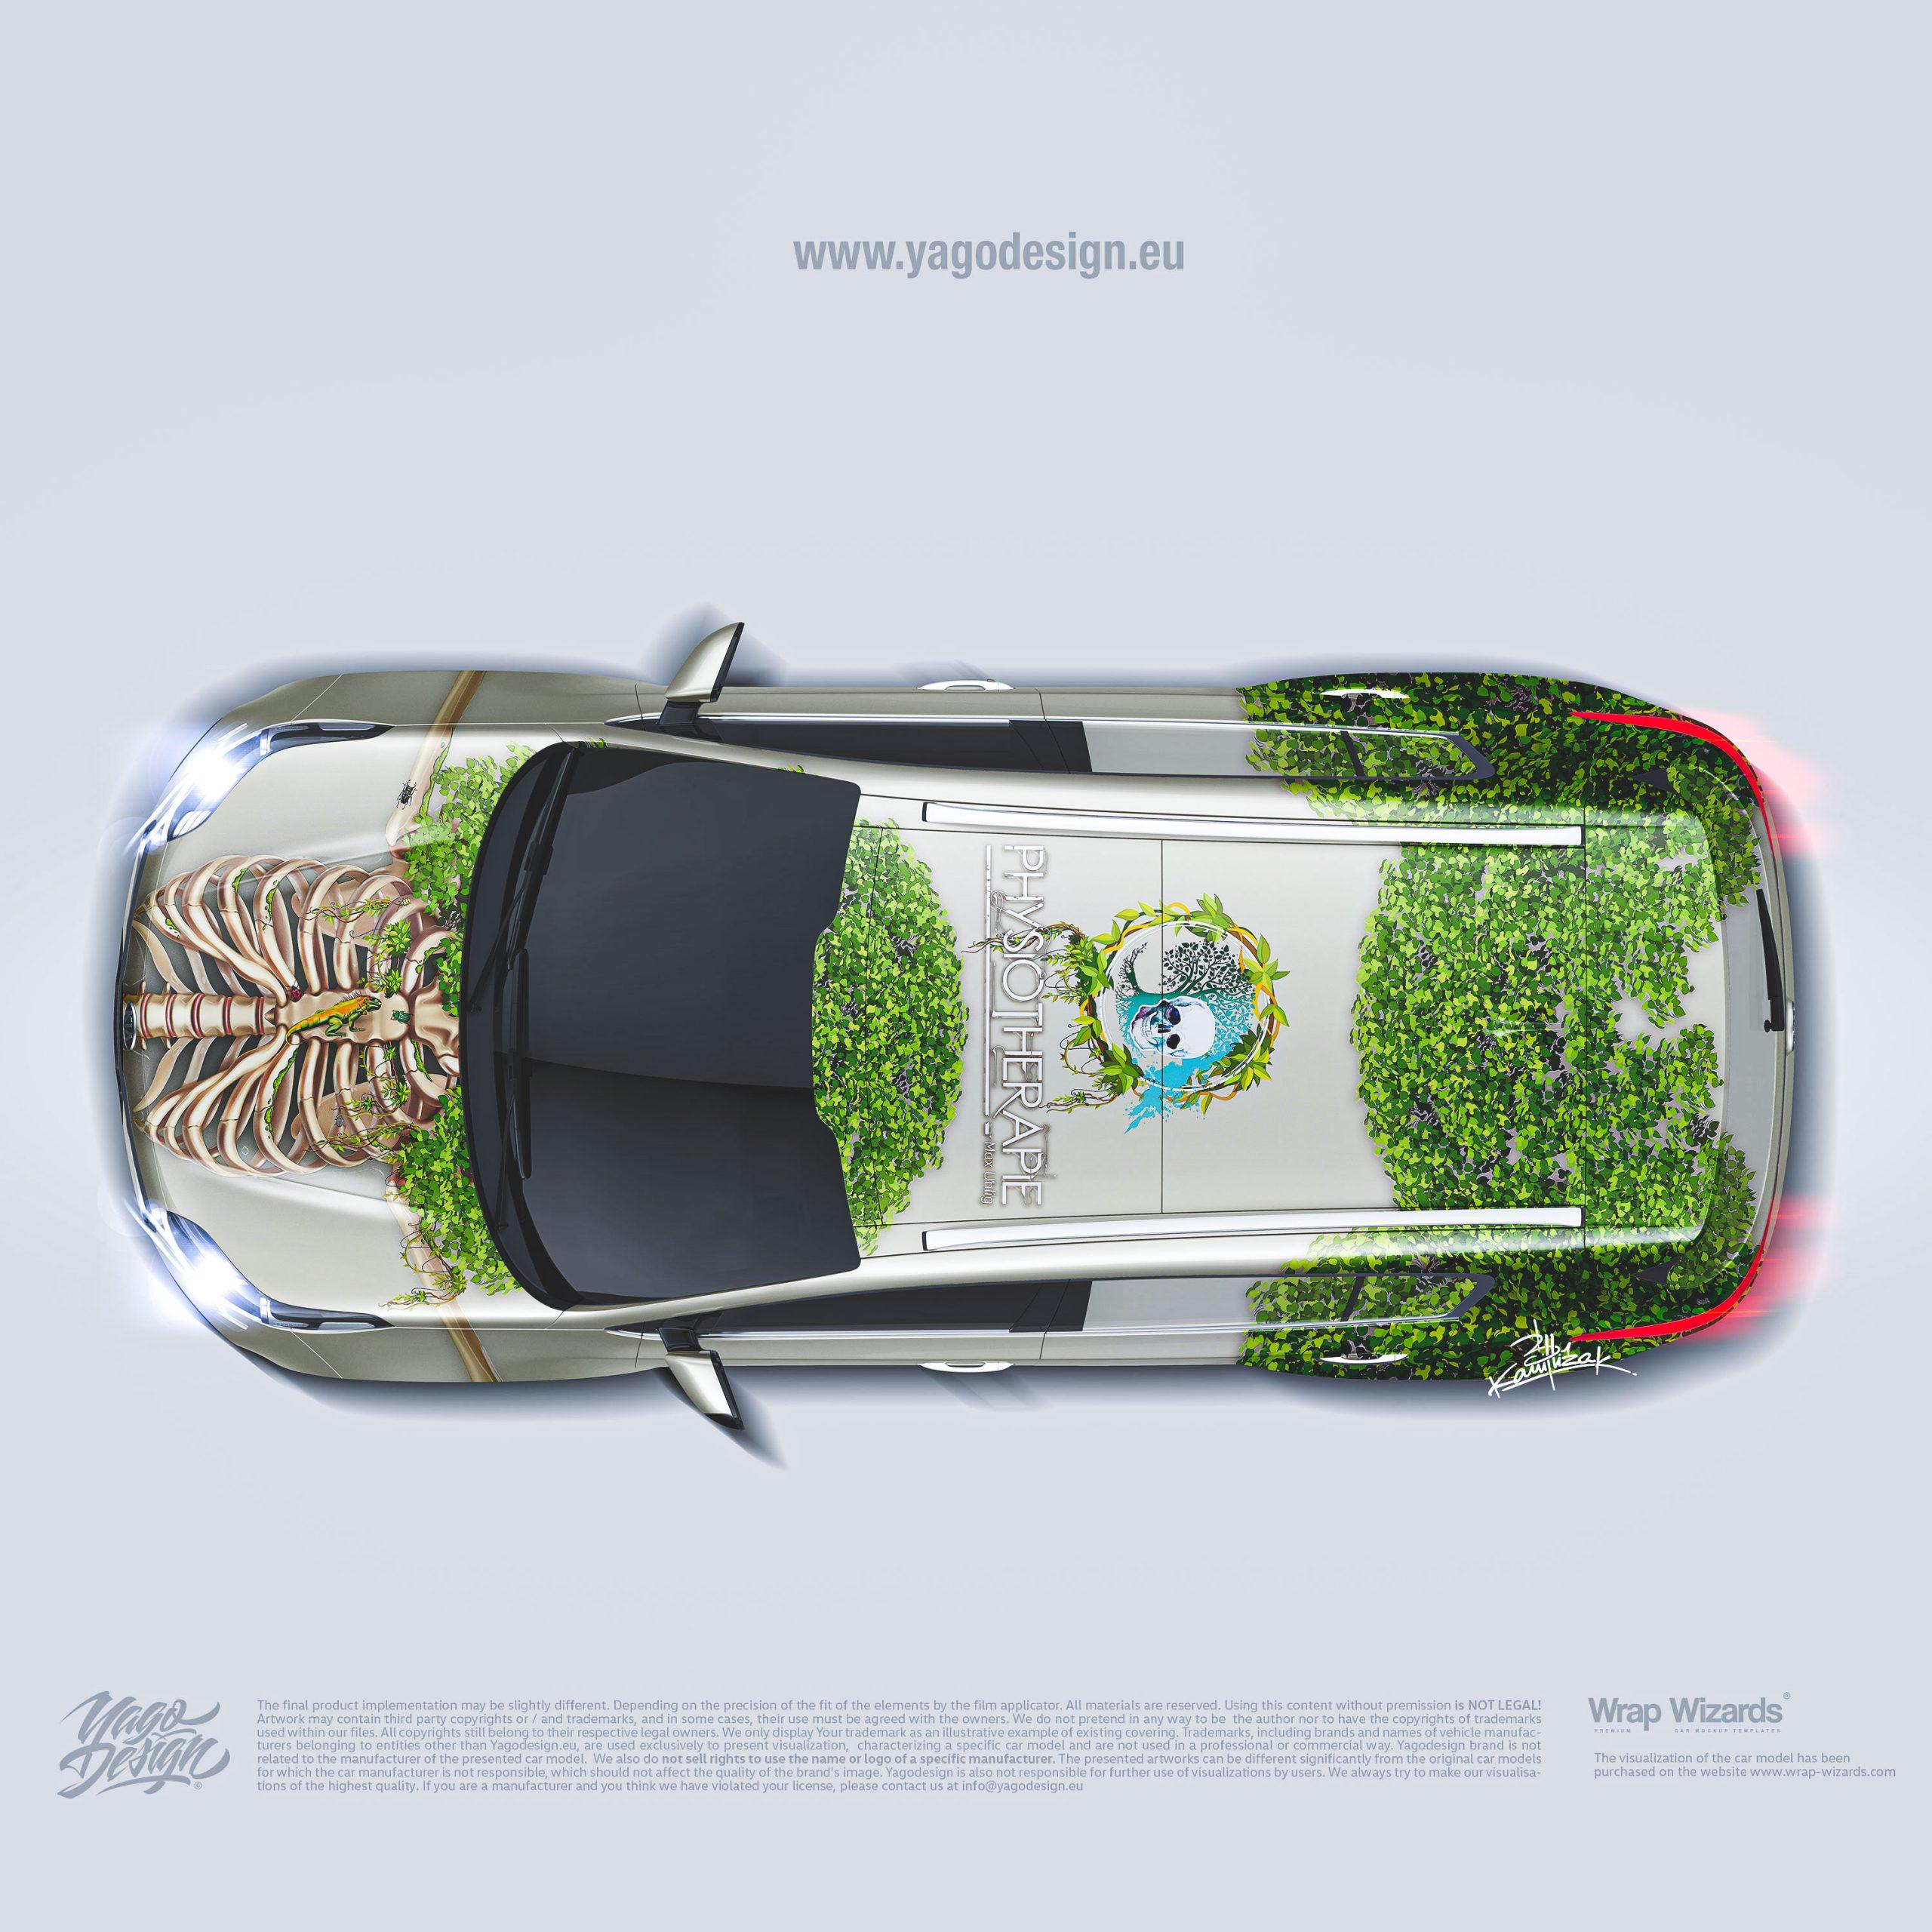 KIA-Sportage-2016-Livery-Design-By-Yagodesign-Automotive-Design-Studio-top-view-scaled